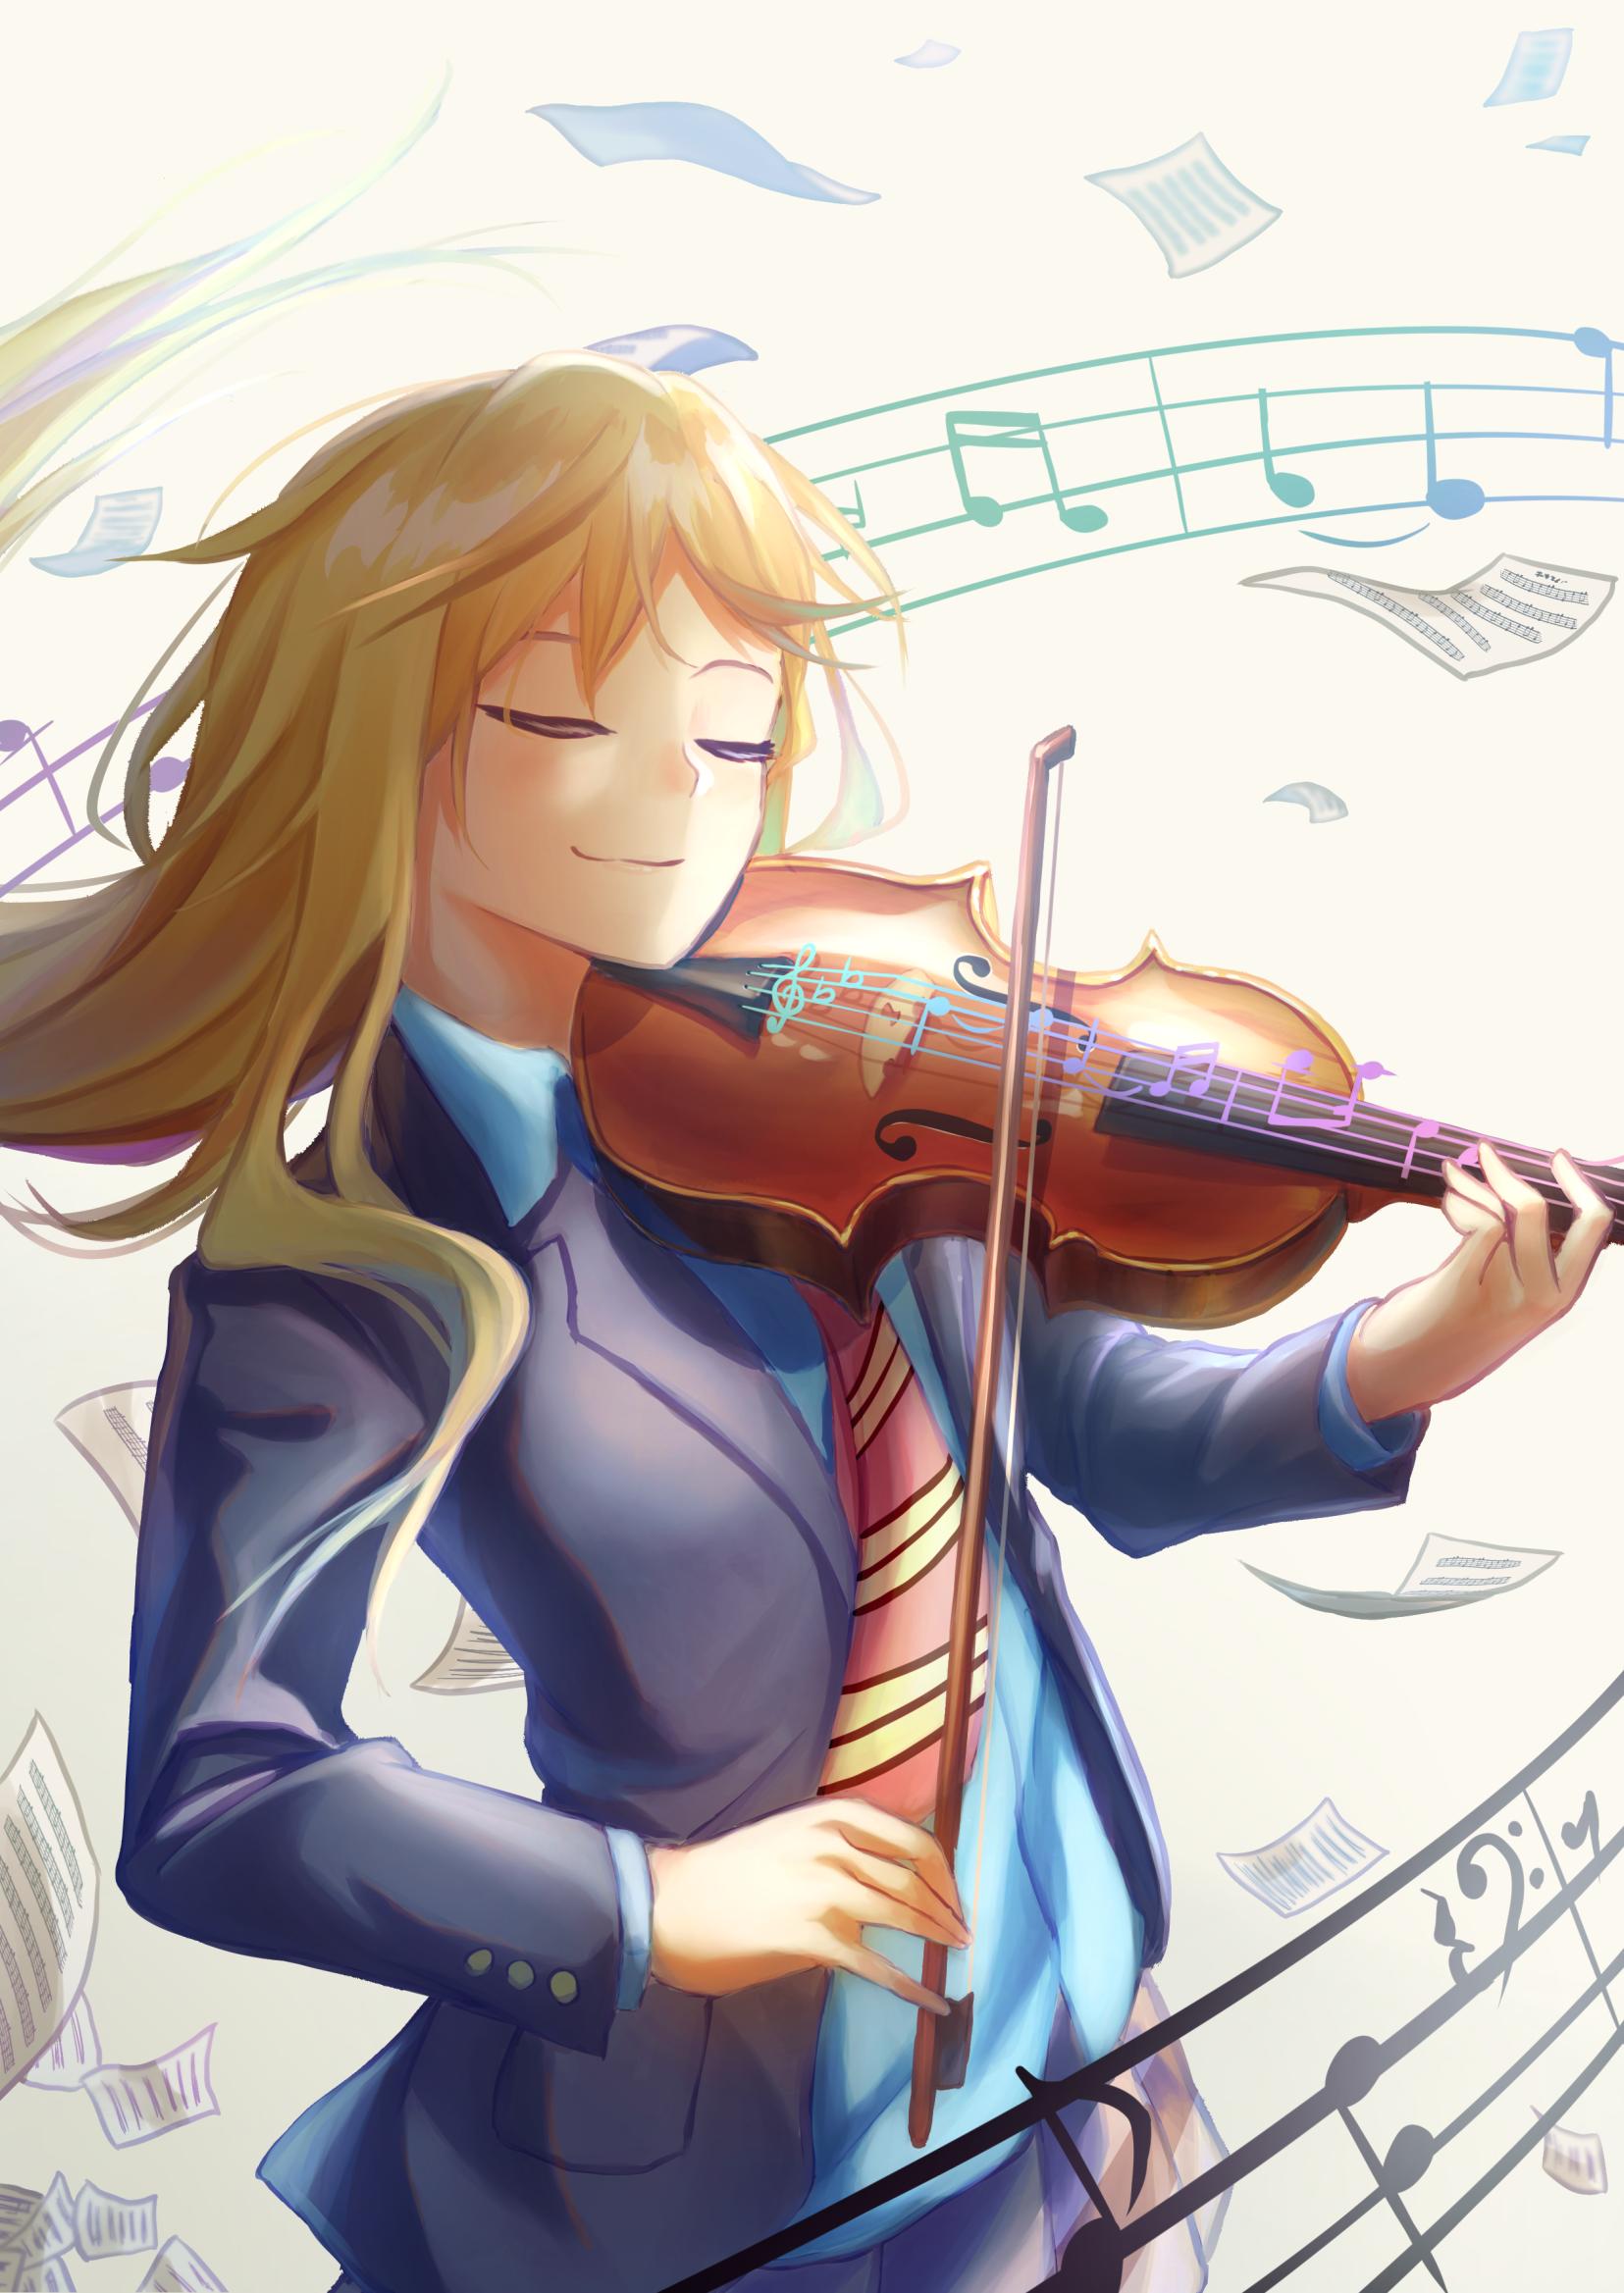 Your lie in april image by Joud on Kaori Miyazono Anime